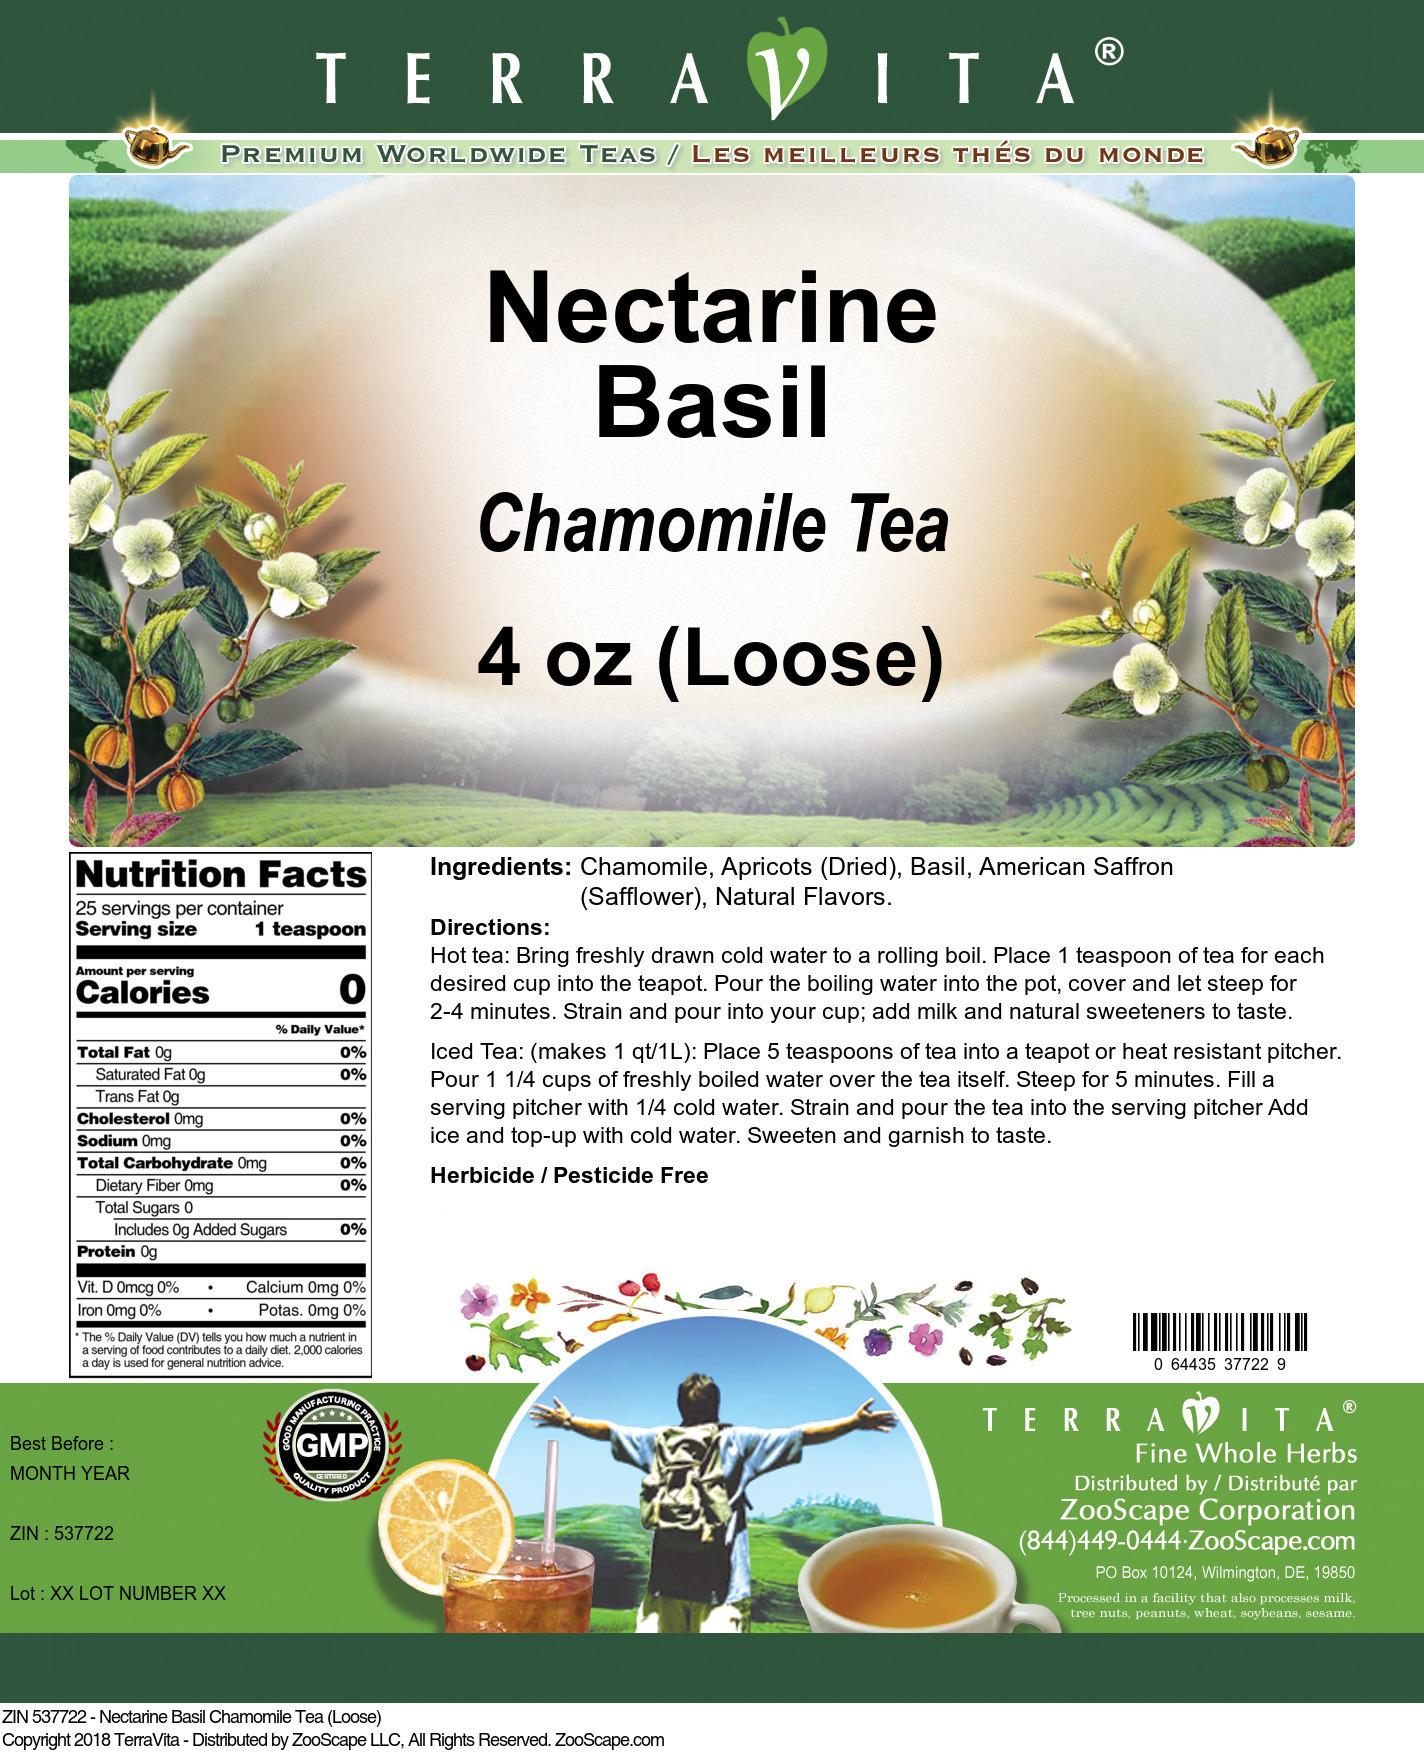 Nectarine Basil Chamomile Tea (Loose)